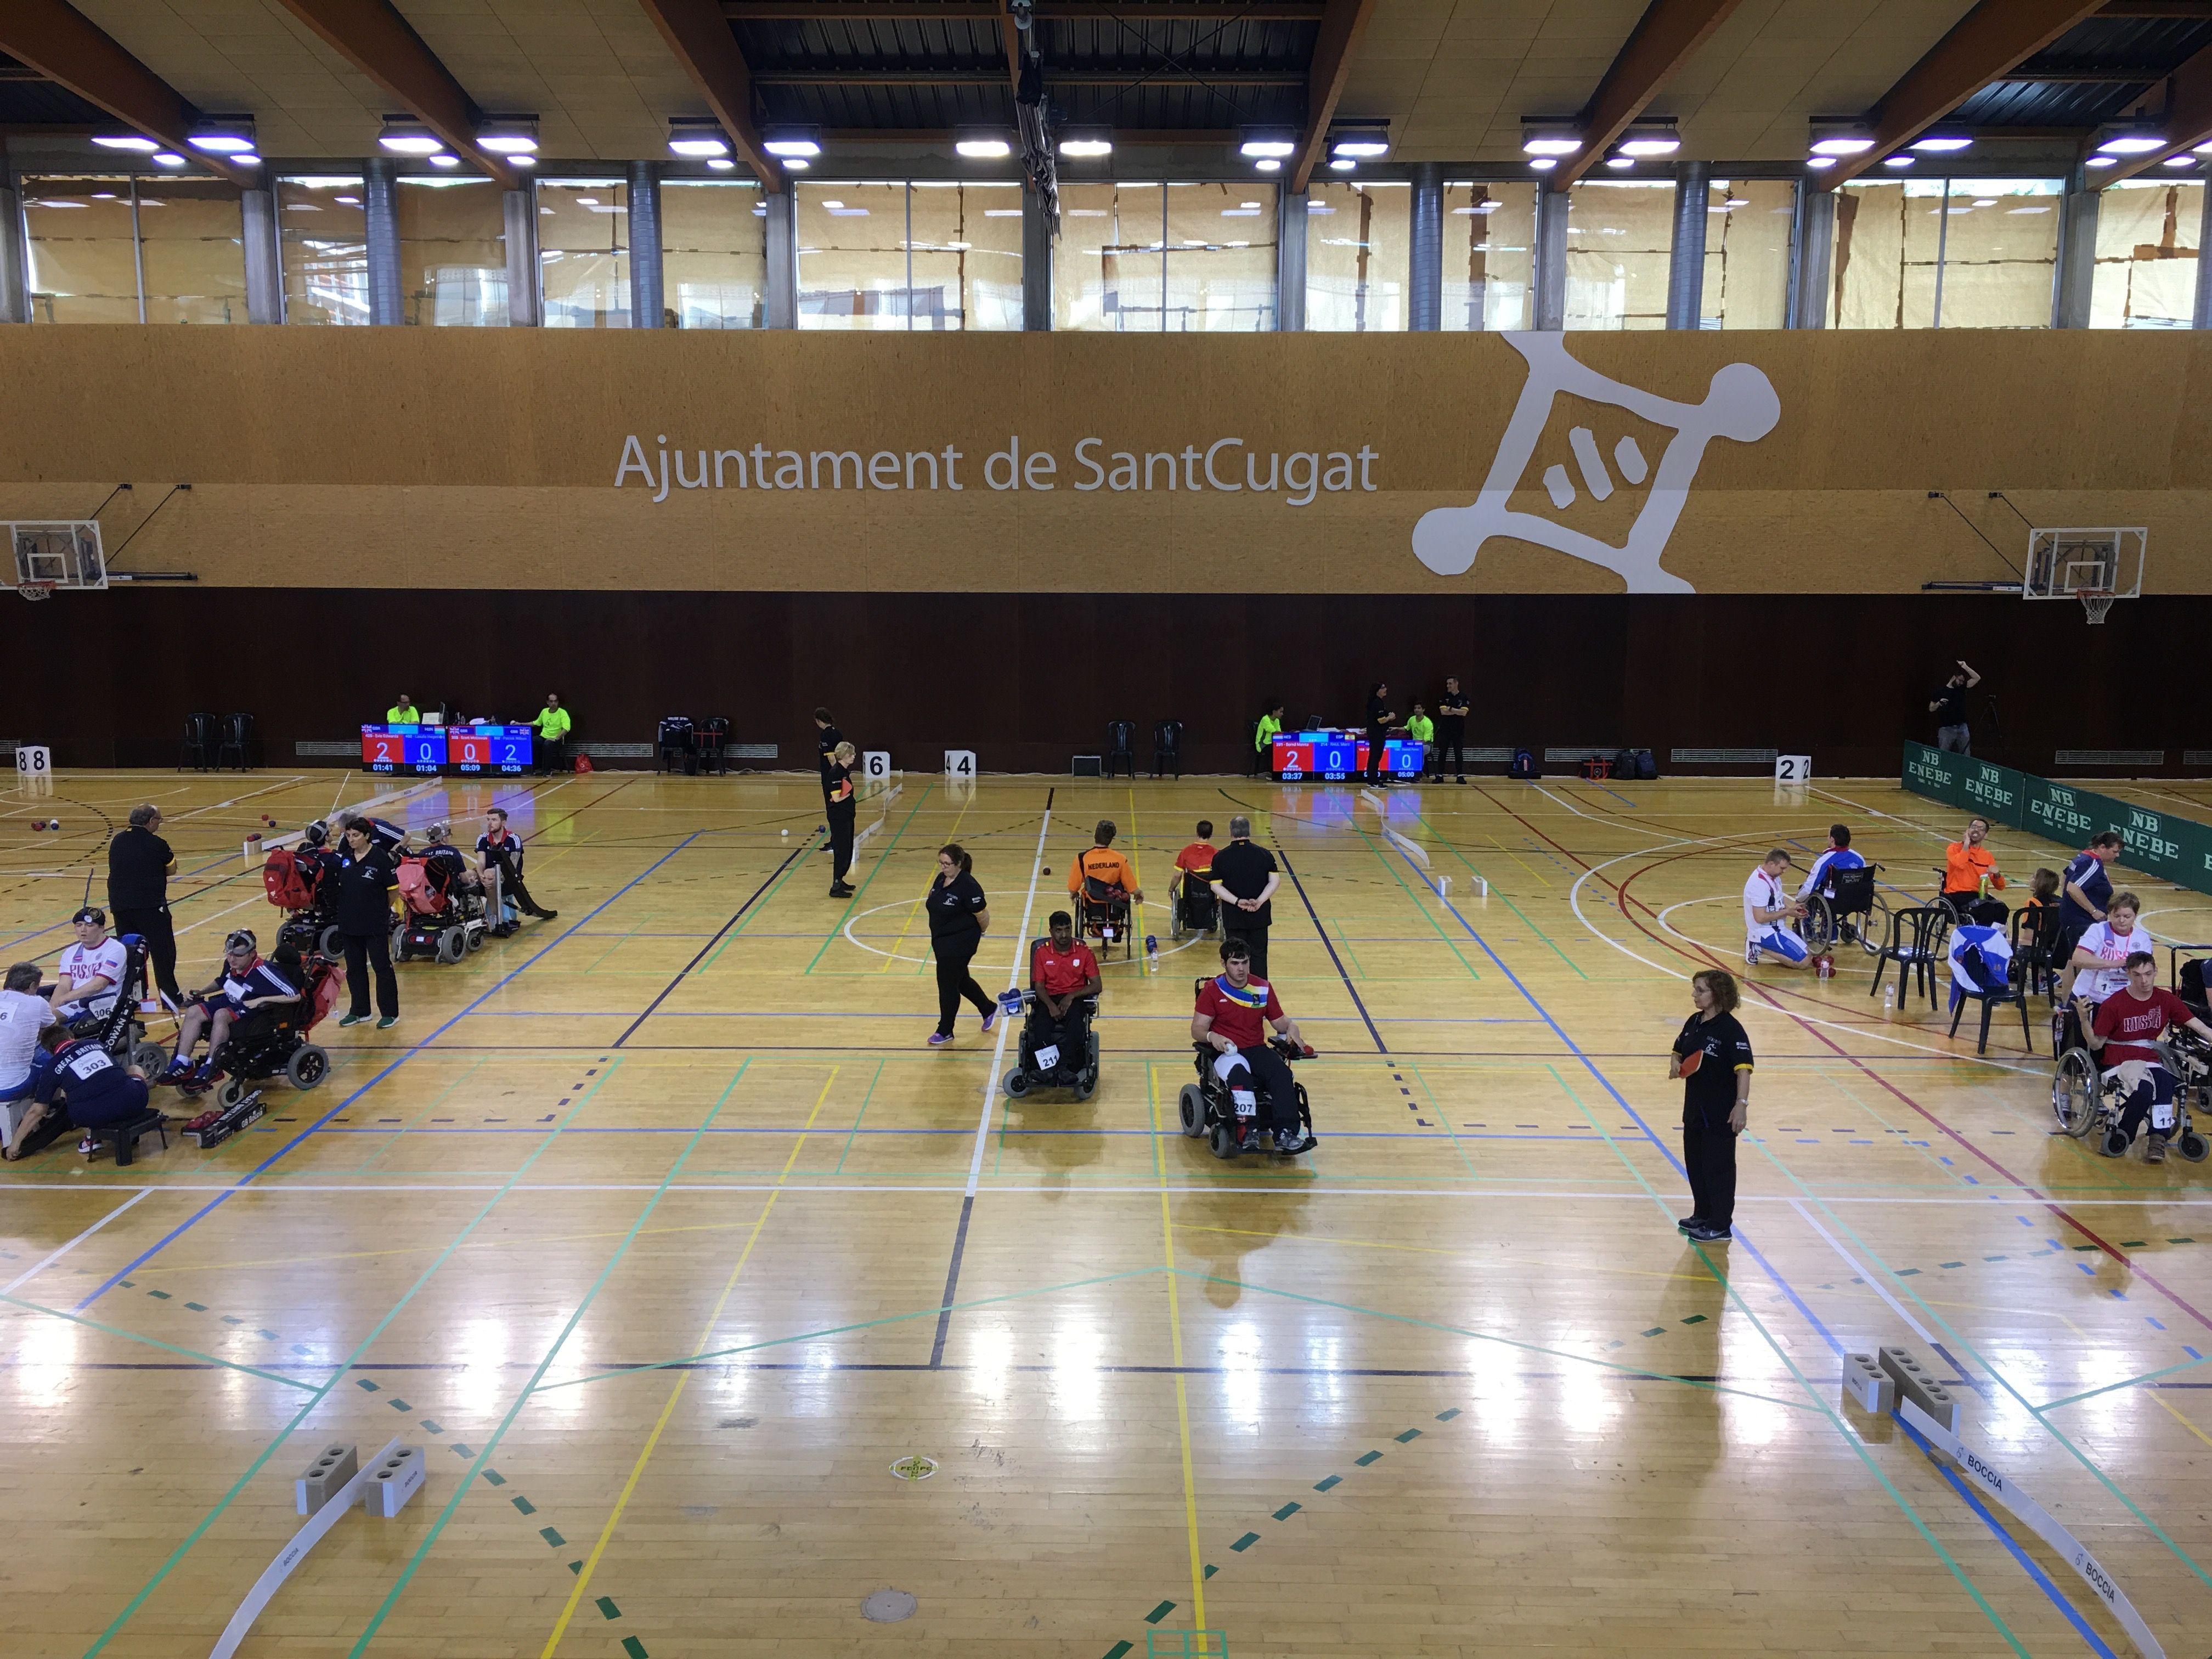 Sant Cugat ha acollit el torneig BISFed 2017 European Regional Open de boccia FOTO: Lala Aguilera